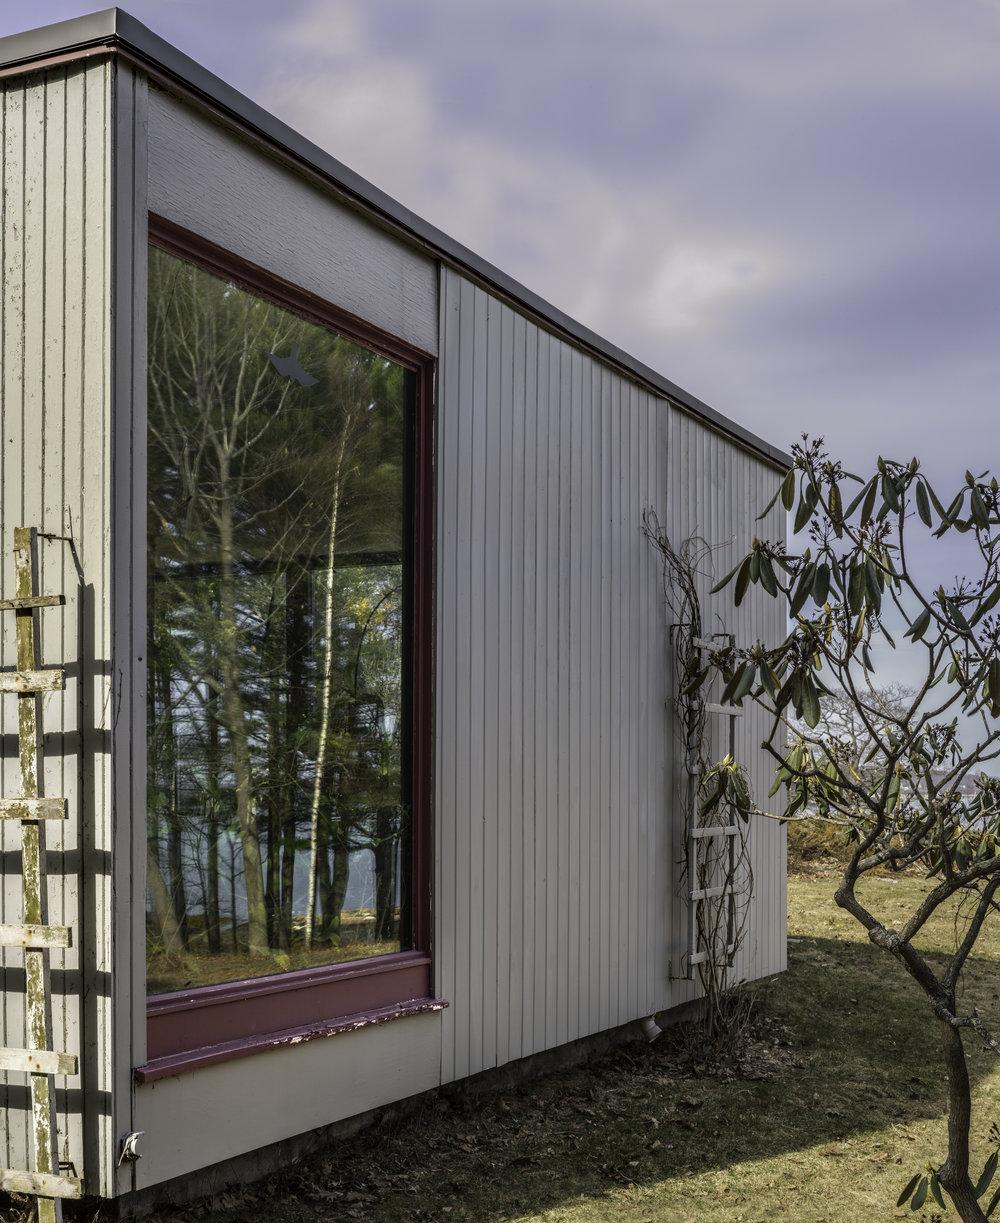 Falmouth_Thornhurst_48_Payson House_Detail_2_byHeathPaley_4-2017.jpg